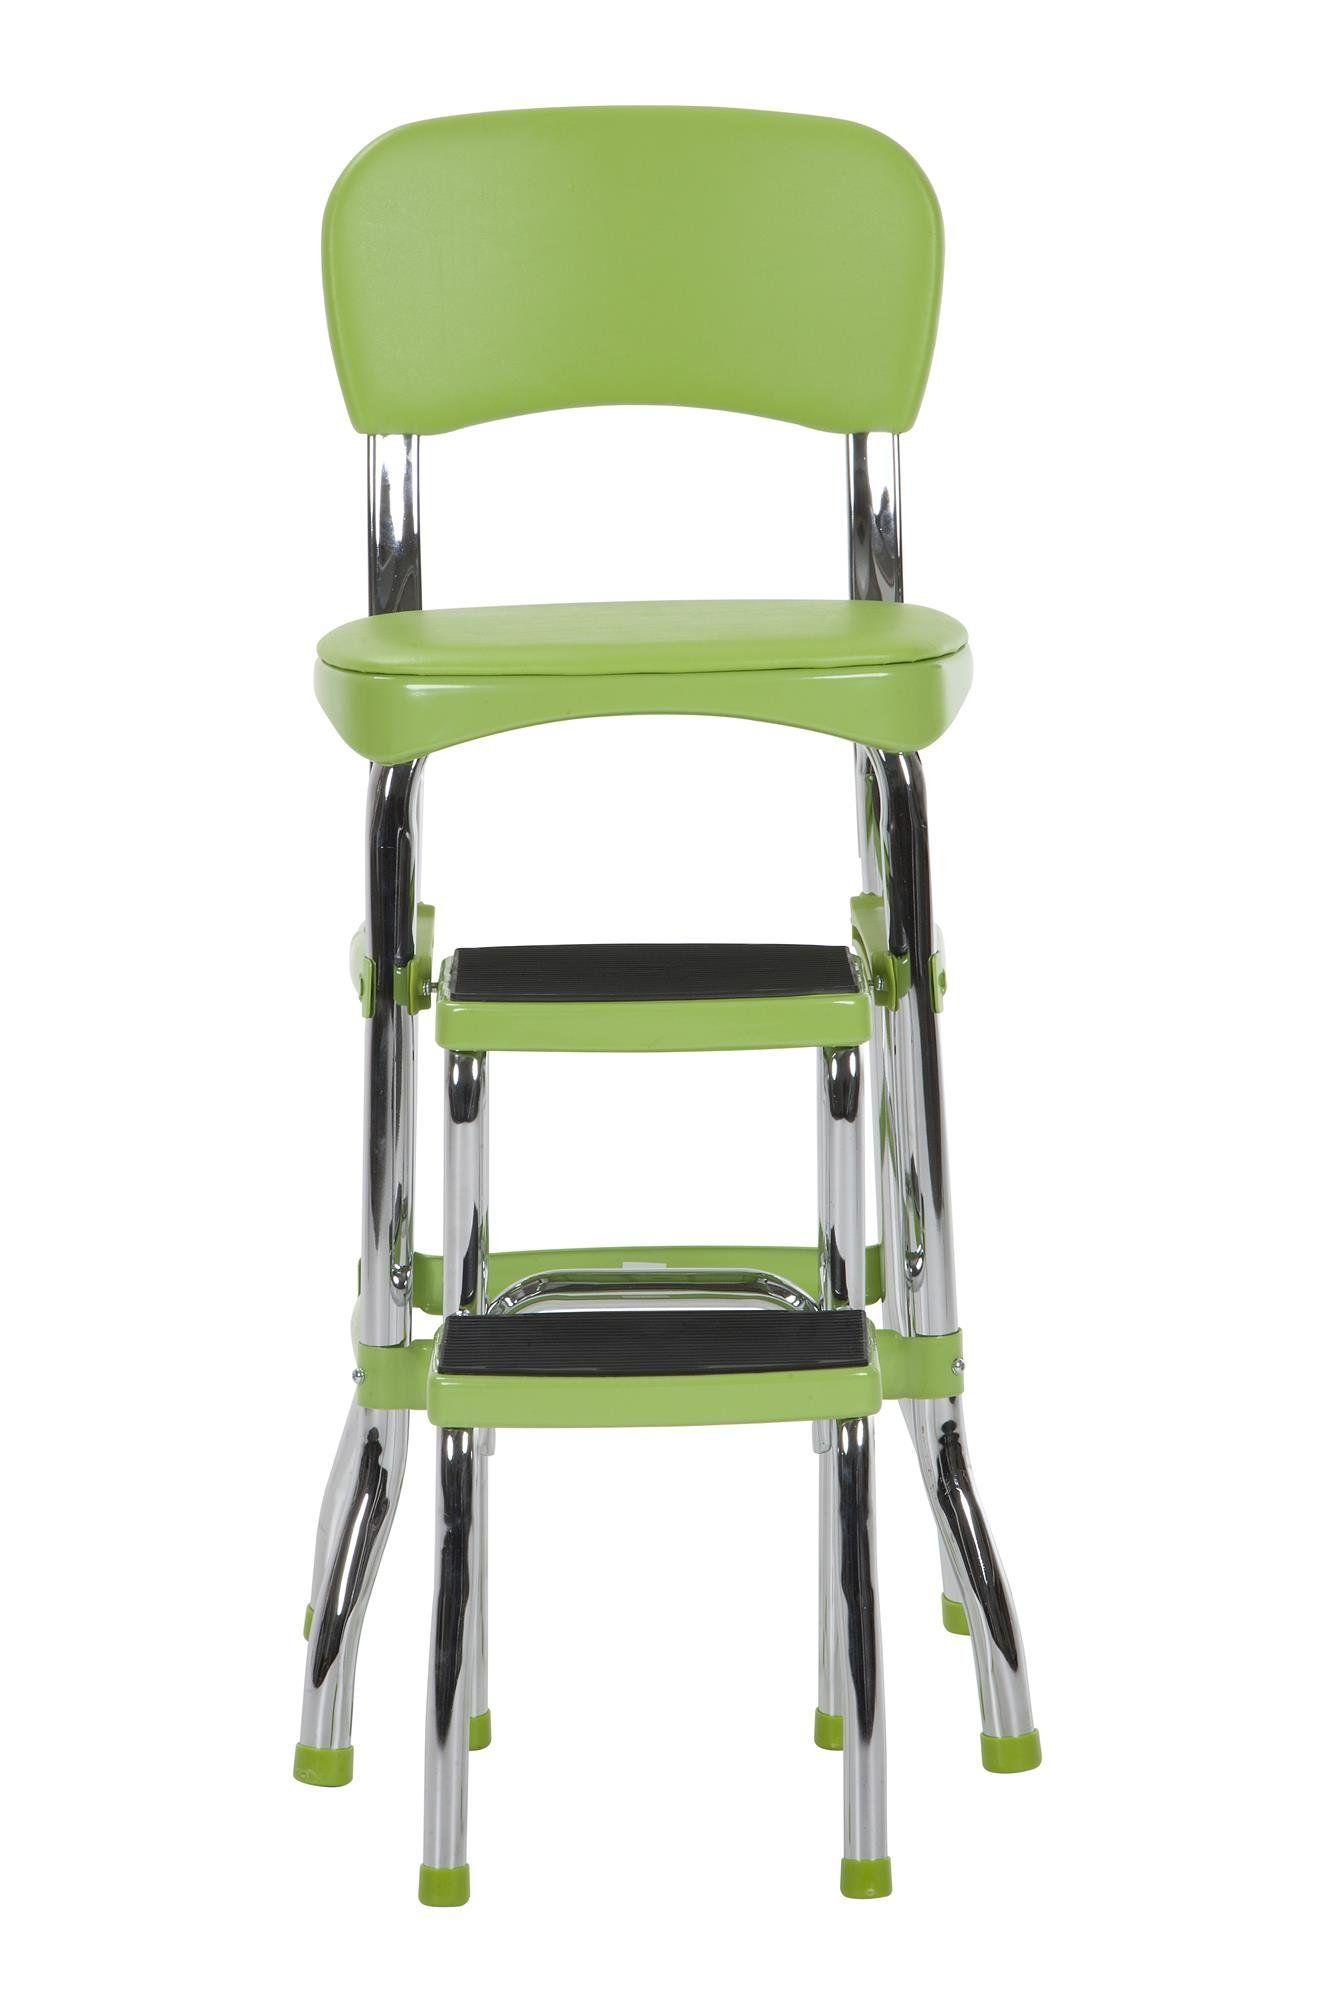 Cosco 11120grn1e retro chairstep stool counter green